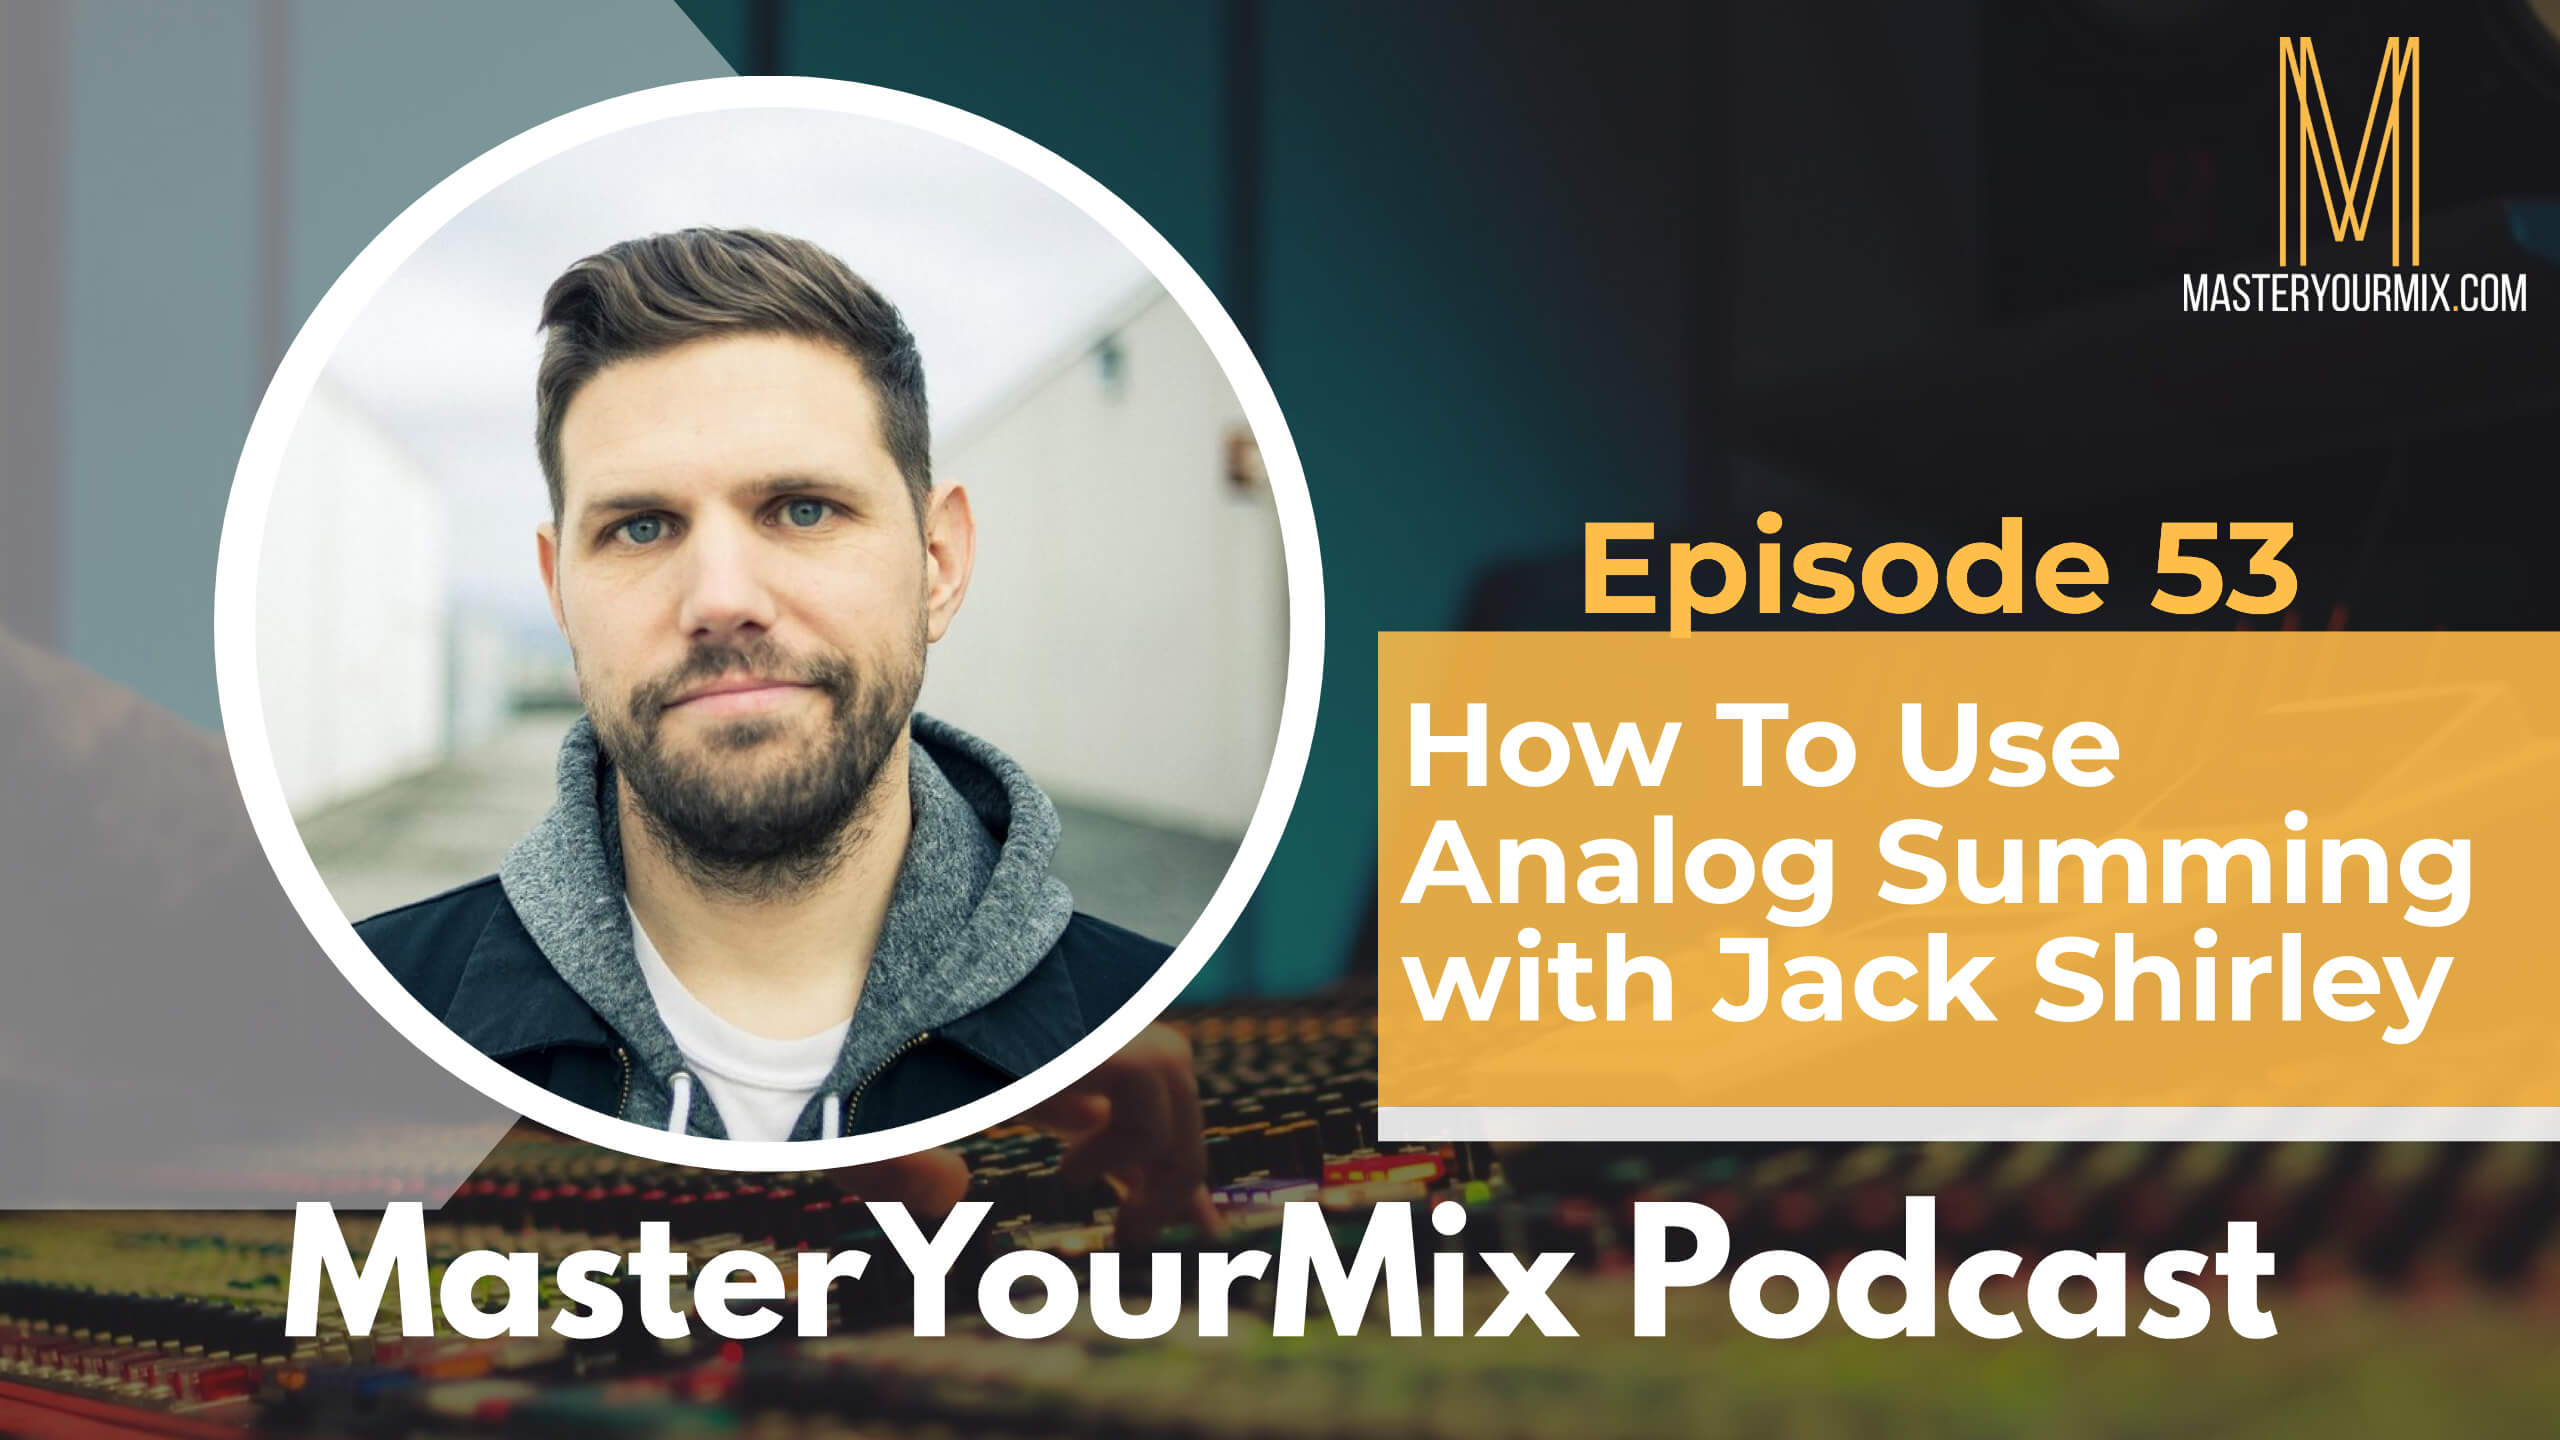 master your mix podcast, episode 53, jack shirley